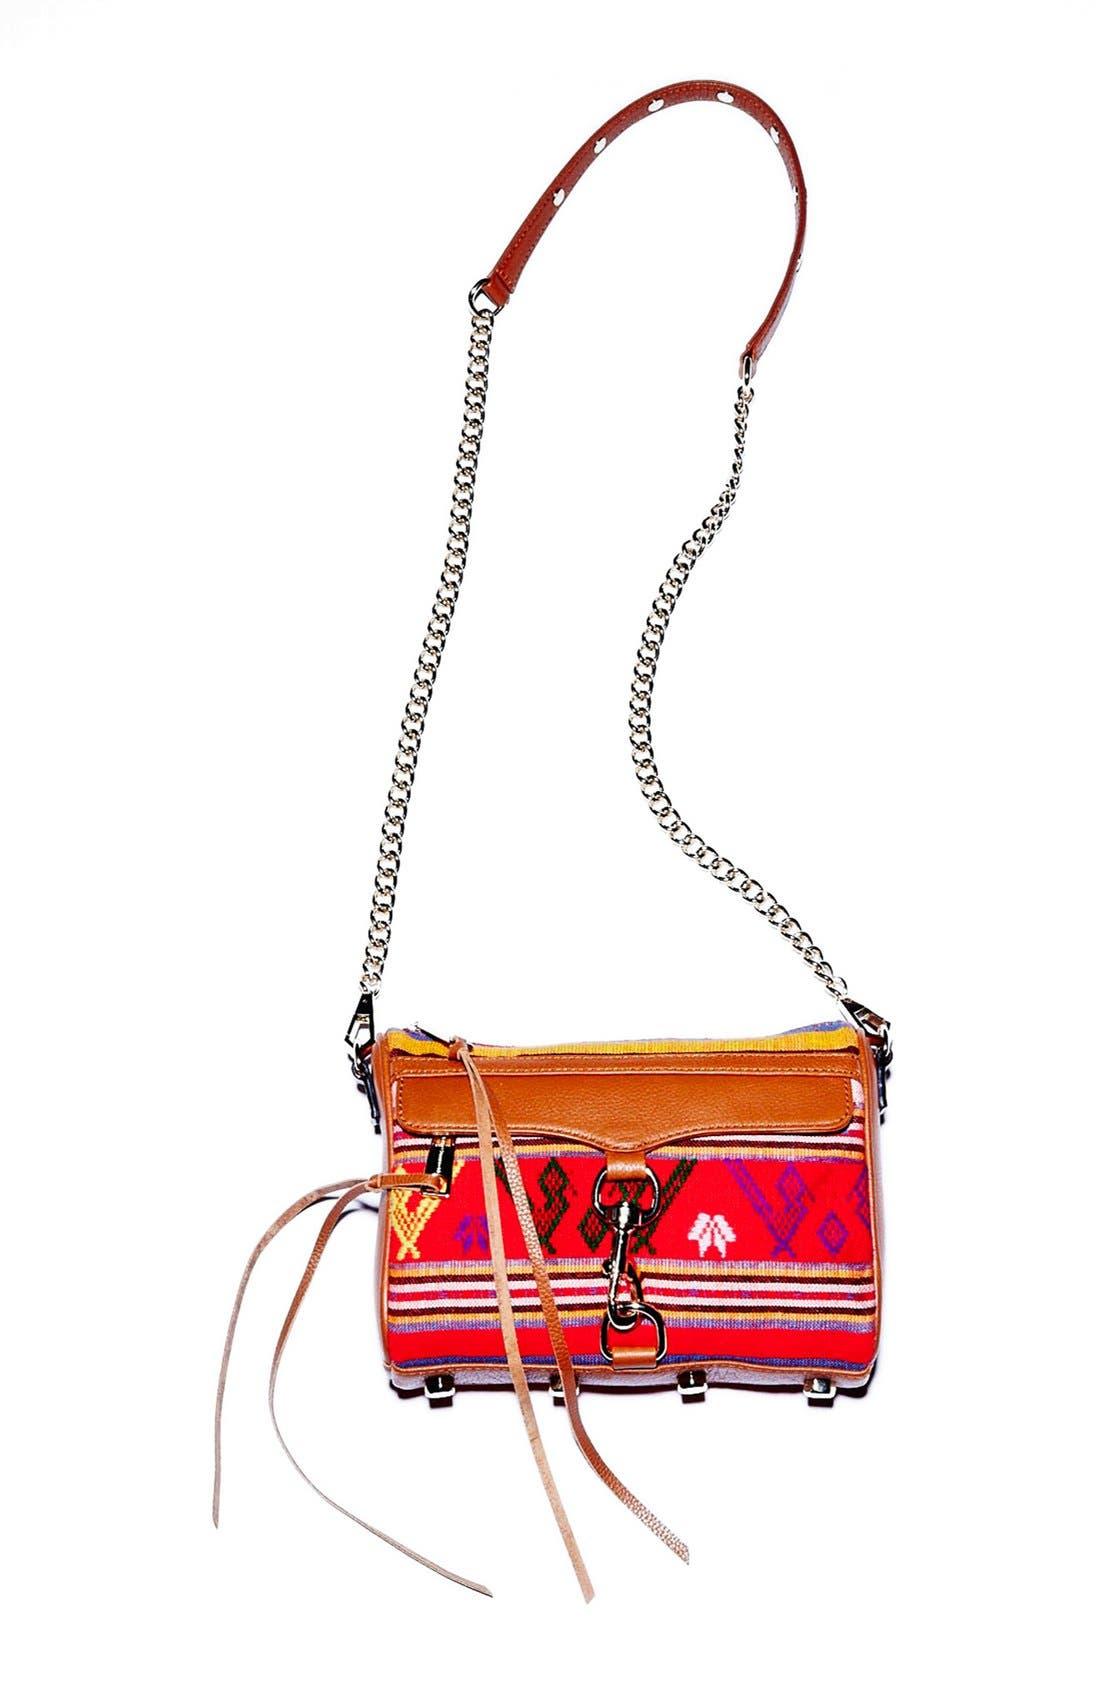 Piece & Co. and Rebecca Minkoff 'Mini MAC' Convertible Crossbody Bag,                             Alternate thumbnail 3, color,                             800